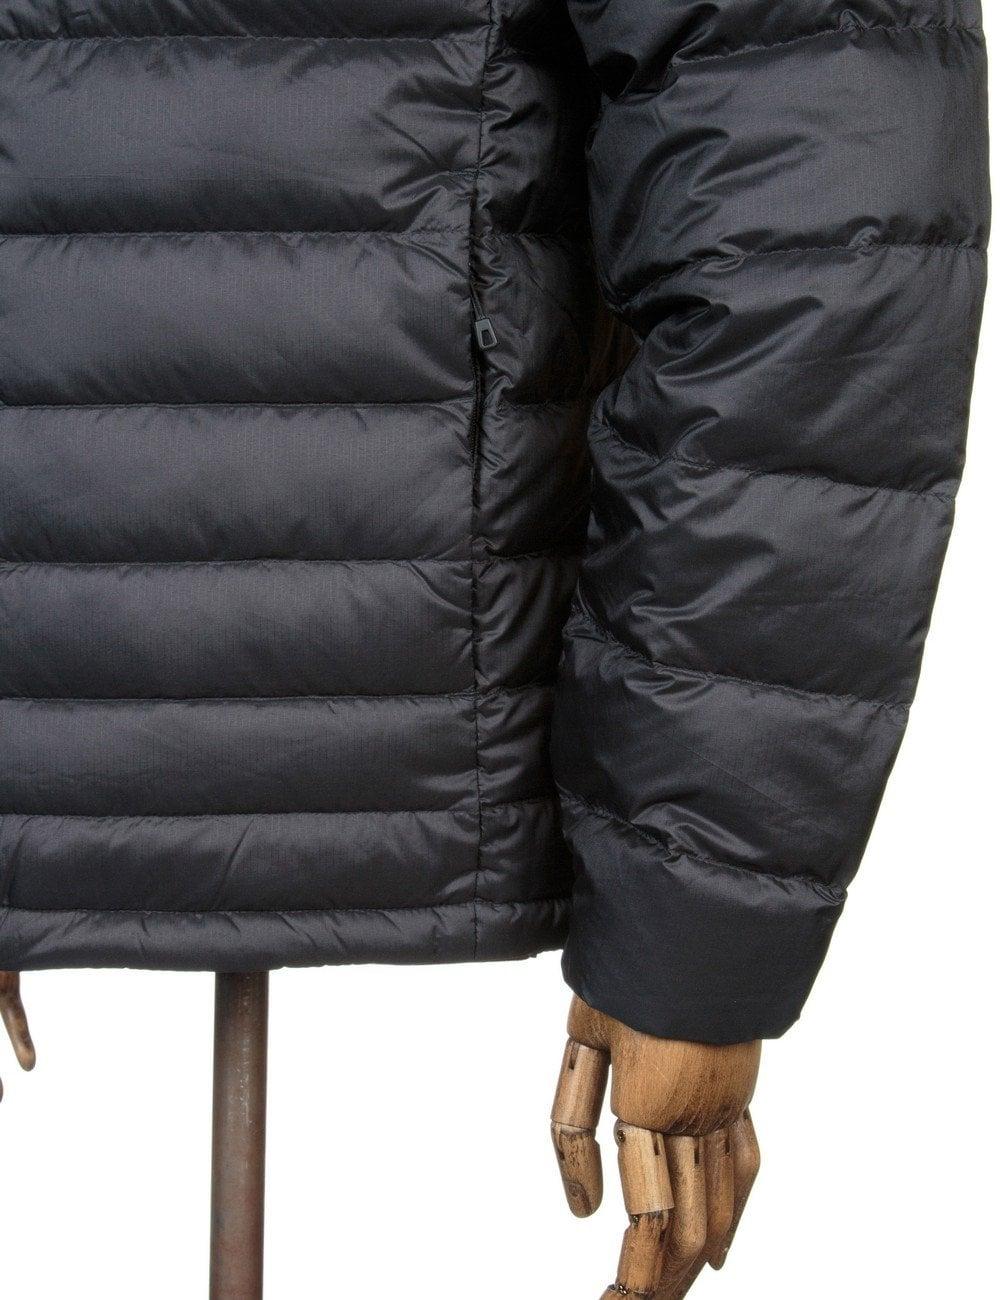 Patagonia Hi Loft Down Jacket Black Clothing From Fat Buddha